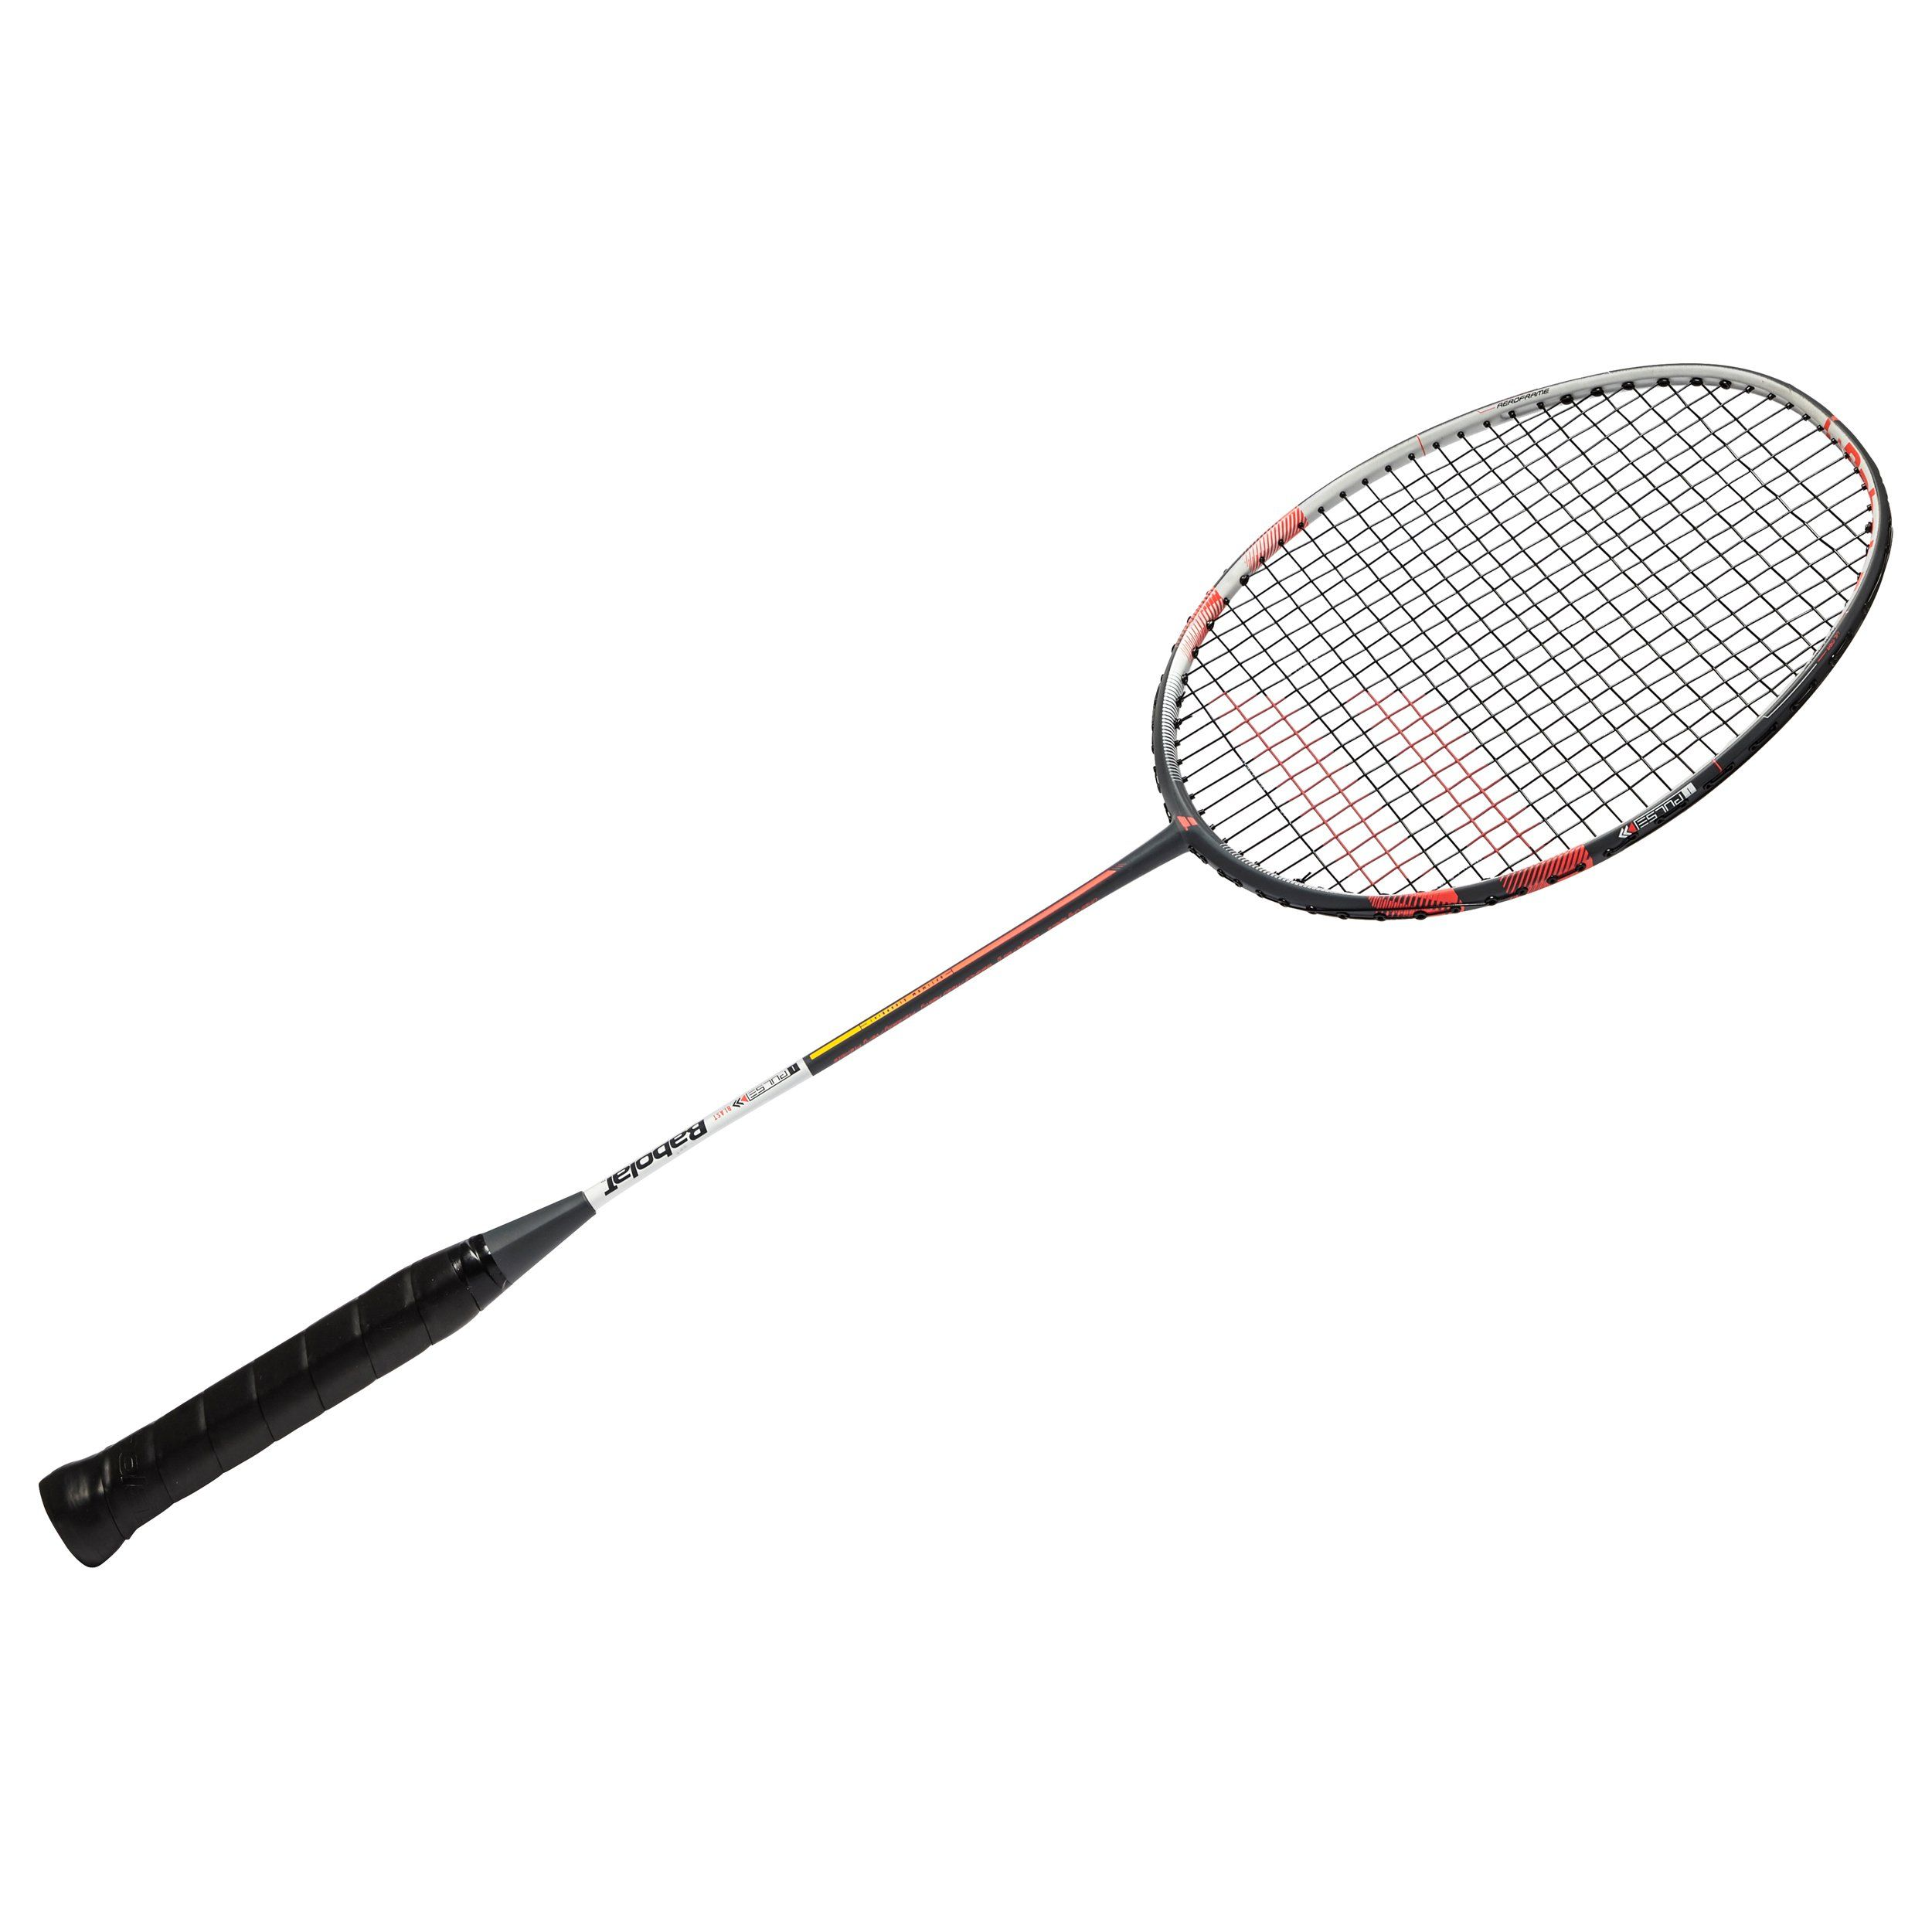 Babolat I-Pulse Badminton Racket